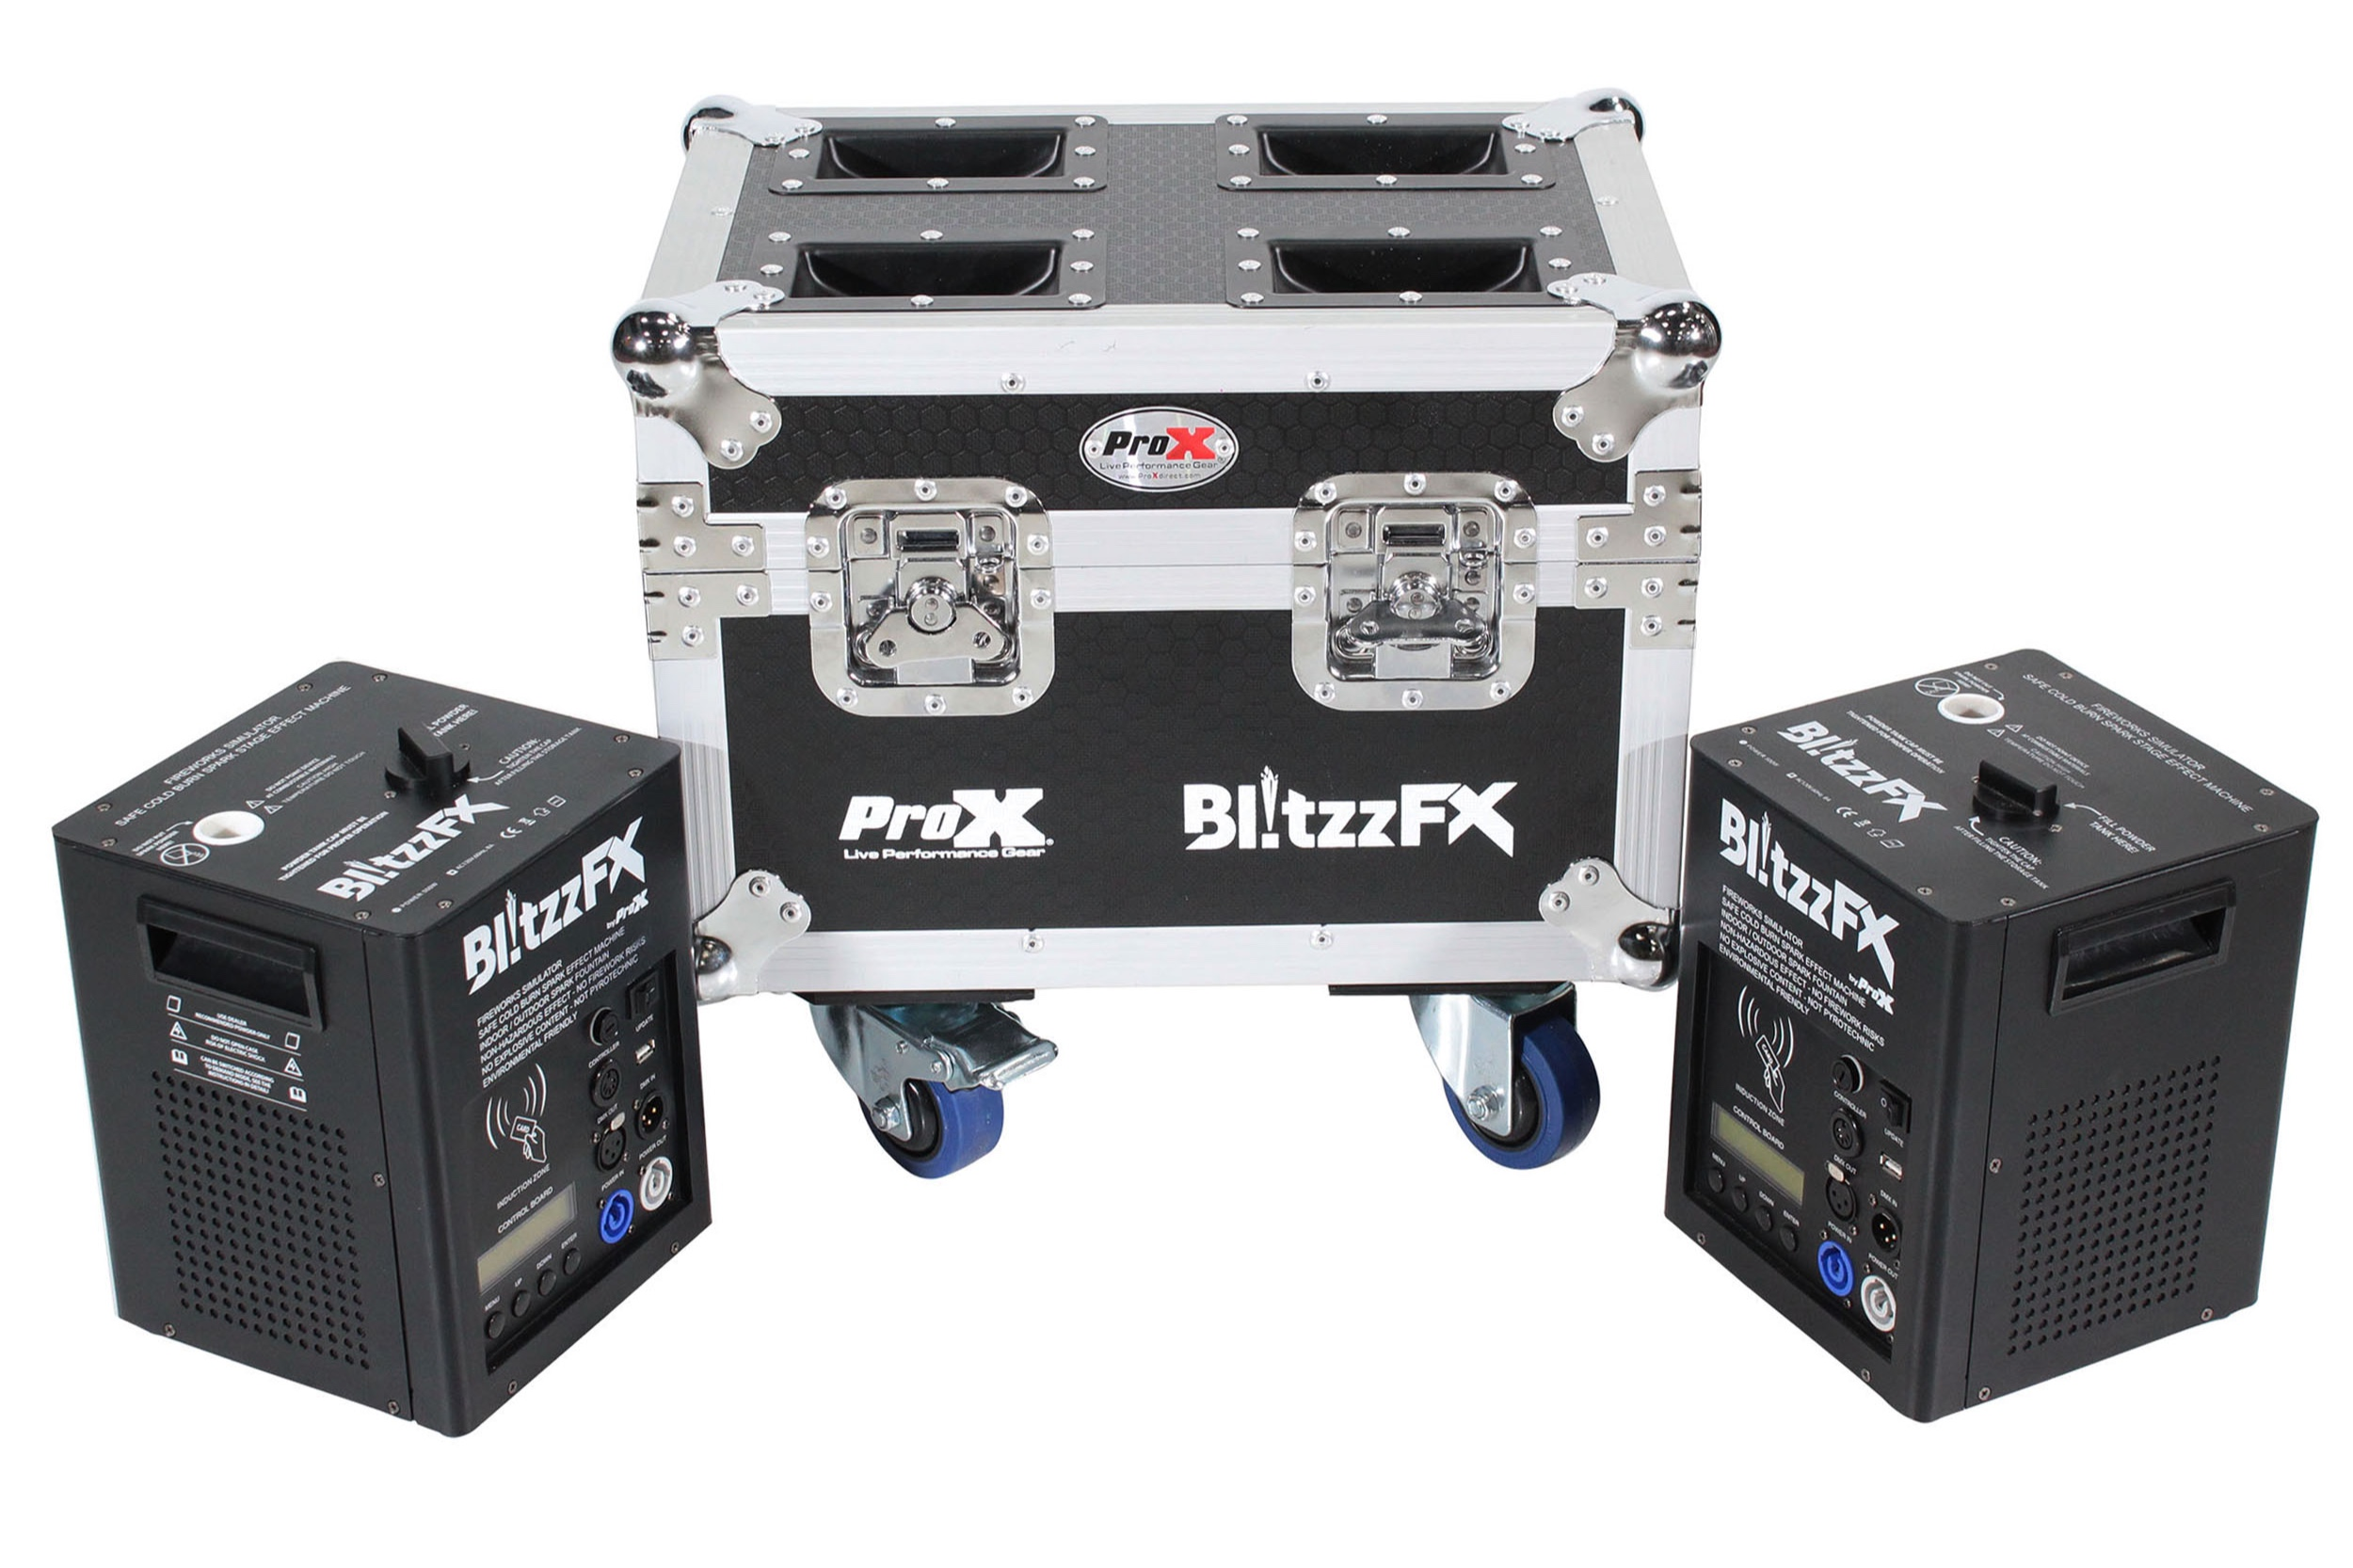 iDJnow - ProX Blitzz FX Cold Spark Machine